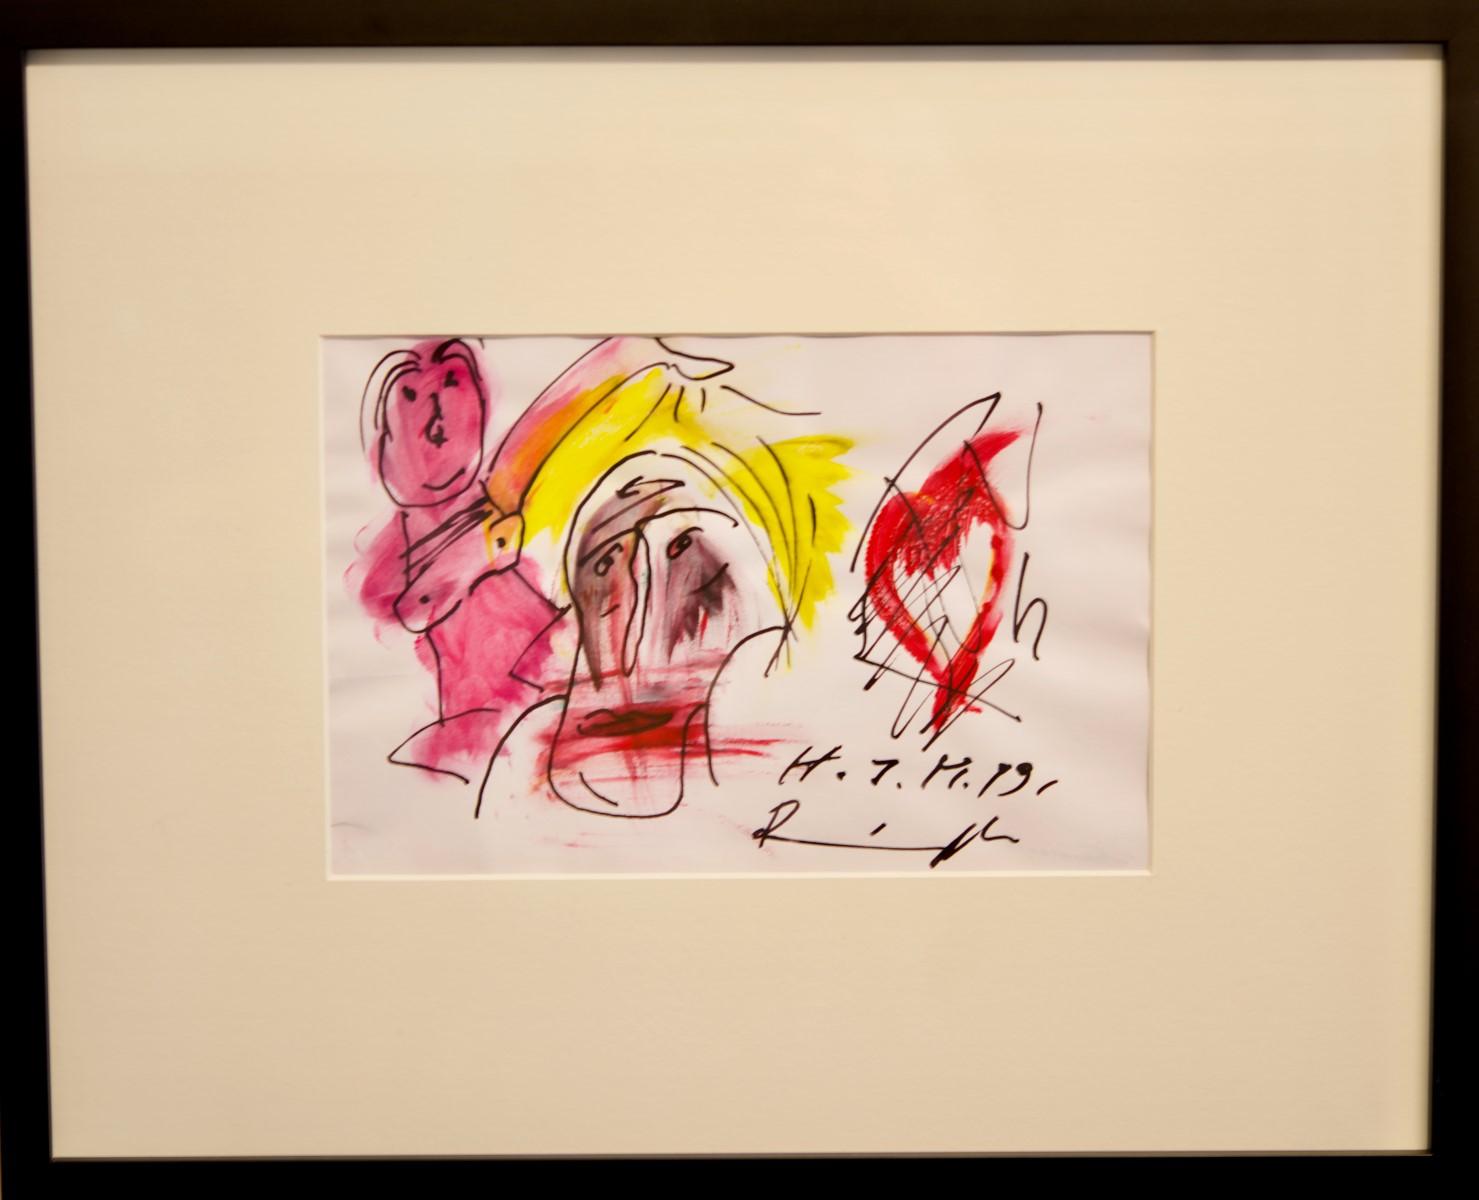 #8 Franz Ringel* (1940-2011), Female attraction | Franz Ringel* (1940-2011), Frauenreiz Image